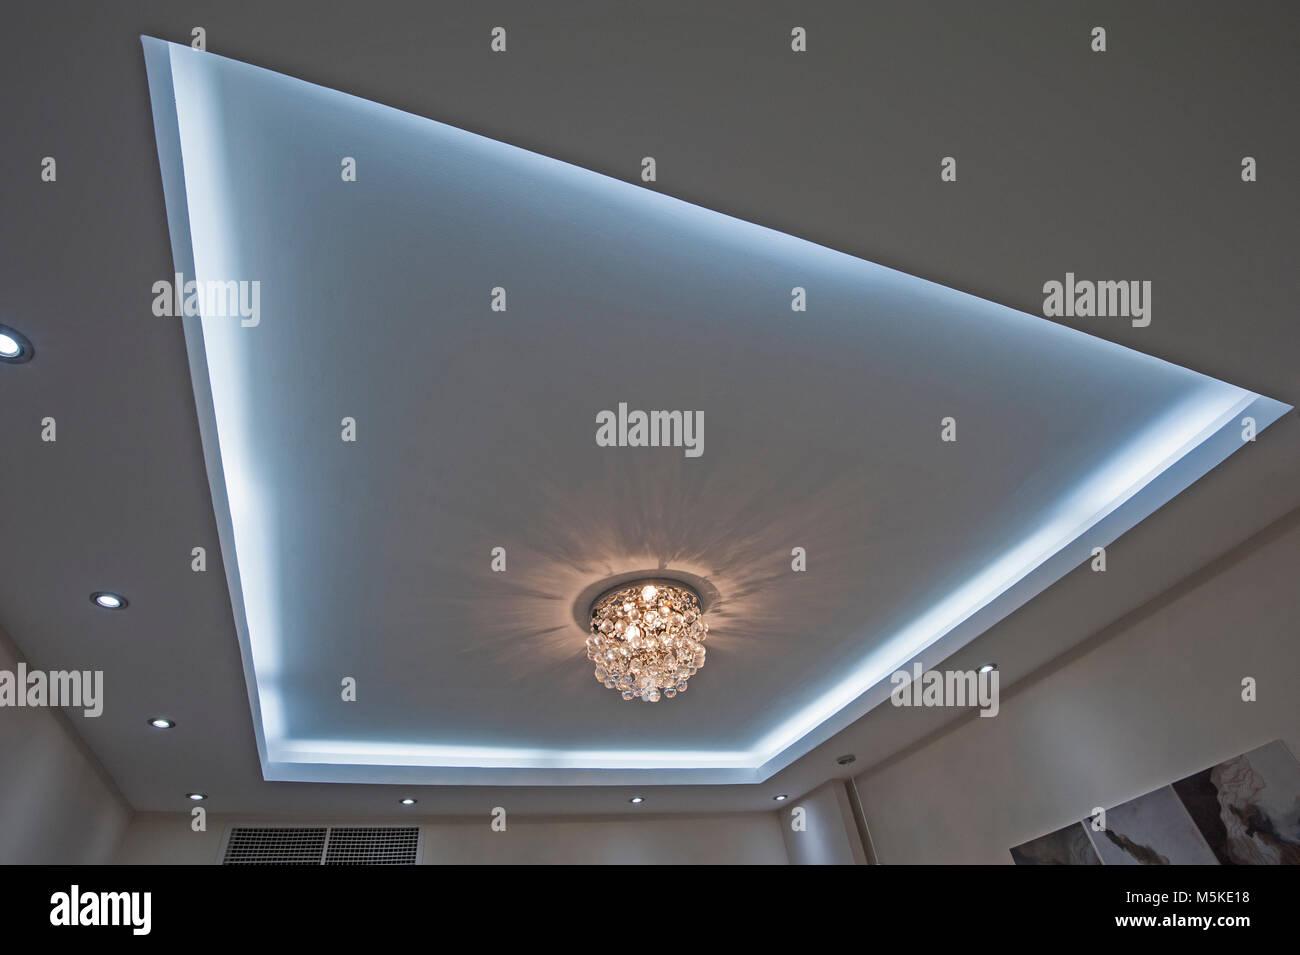 Ornate chandelier style ceiling light inside luxury apartment with ornate chandelier style ceiling light inside luxury apartment with led lighting surround aloadofball Choice Image